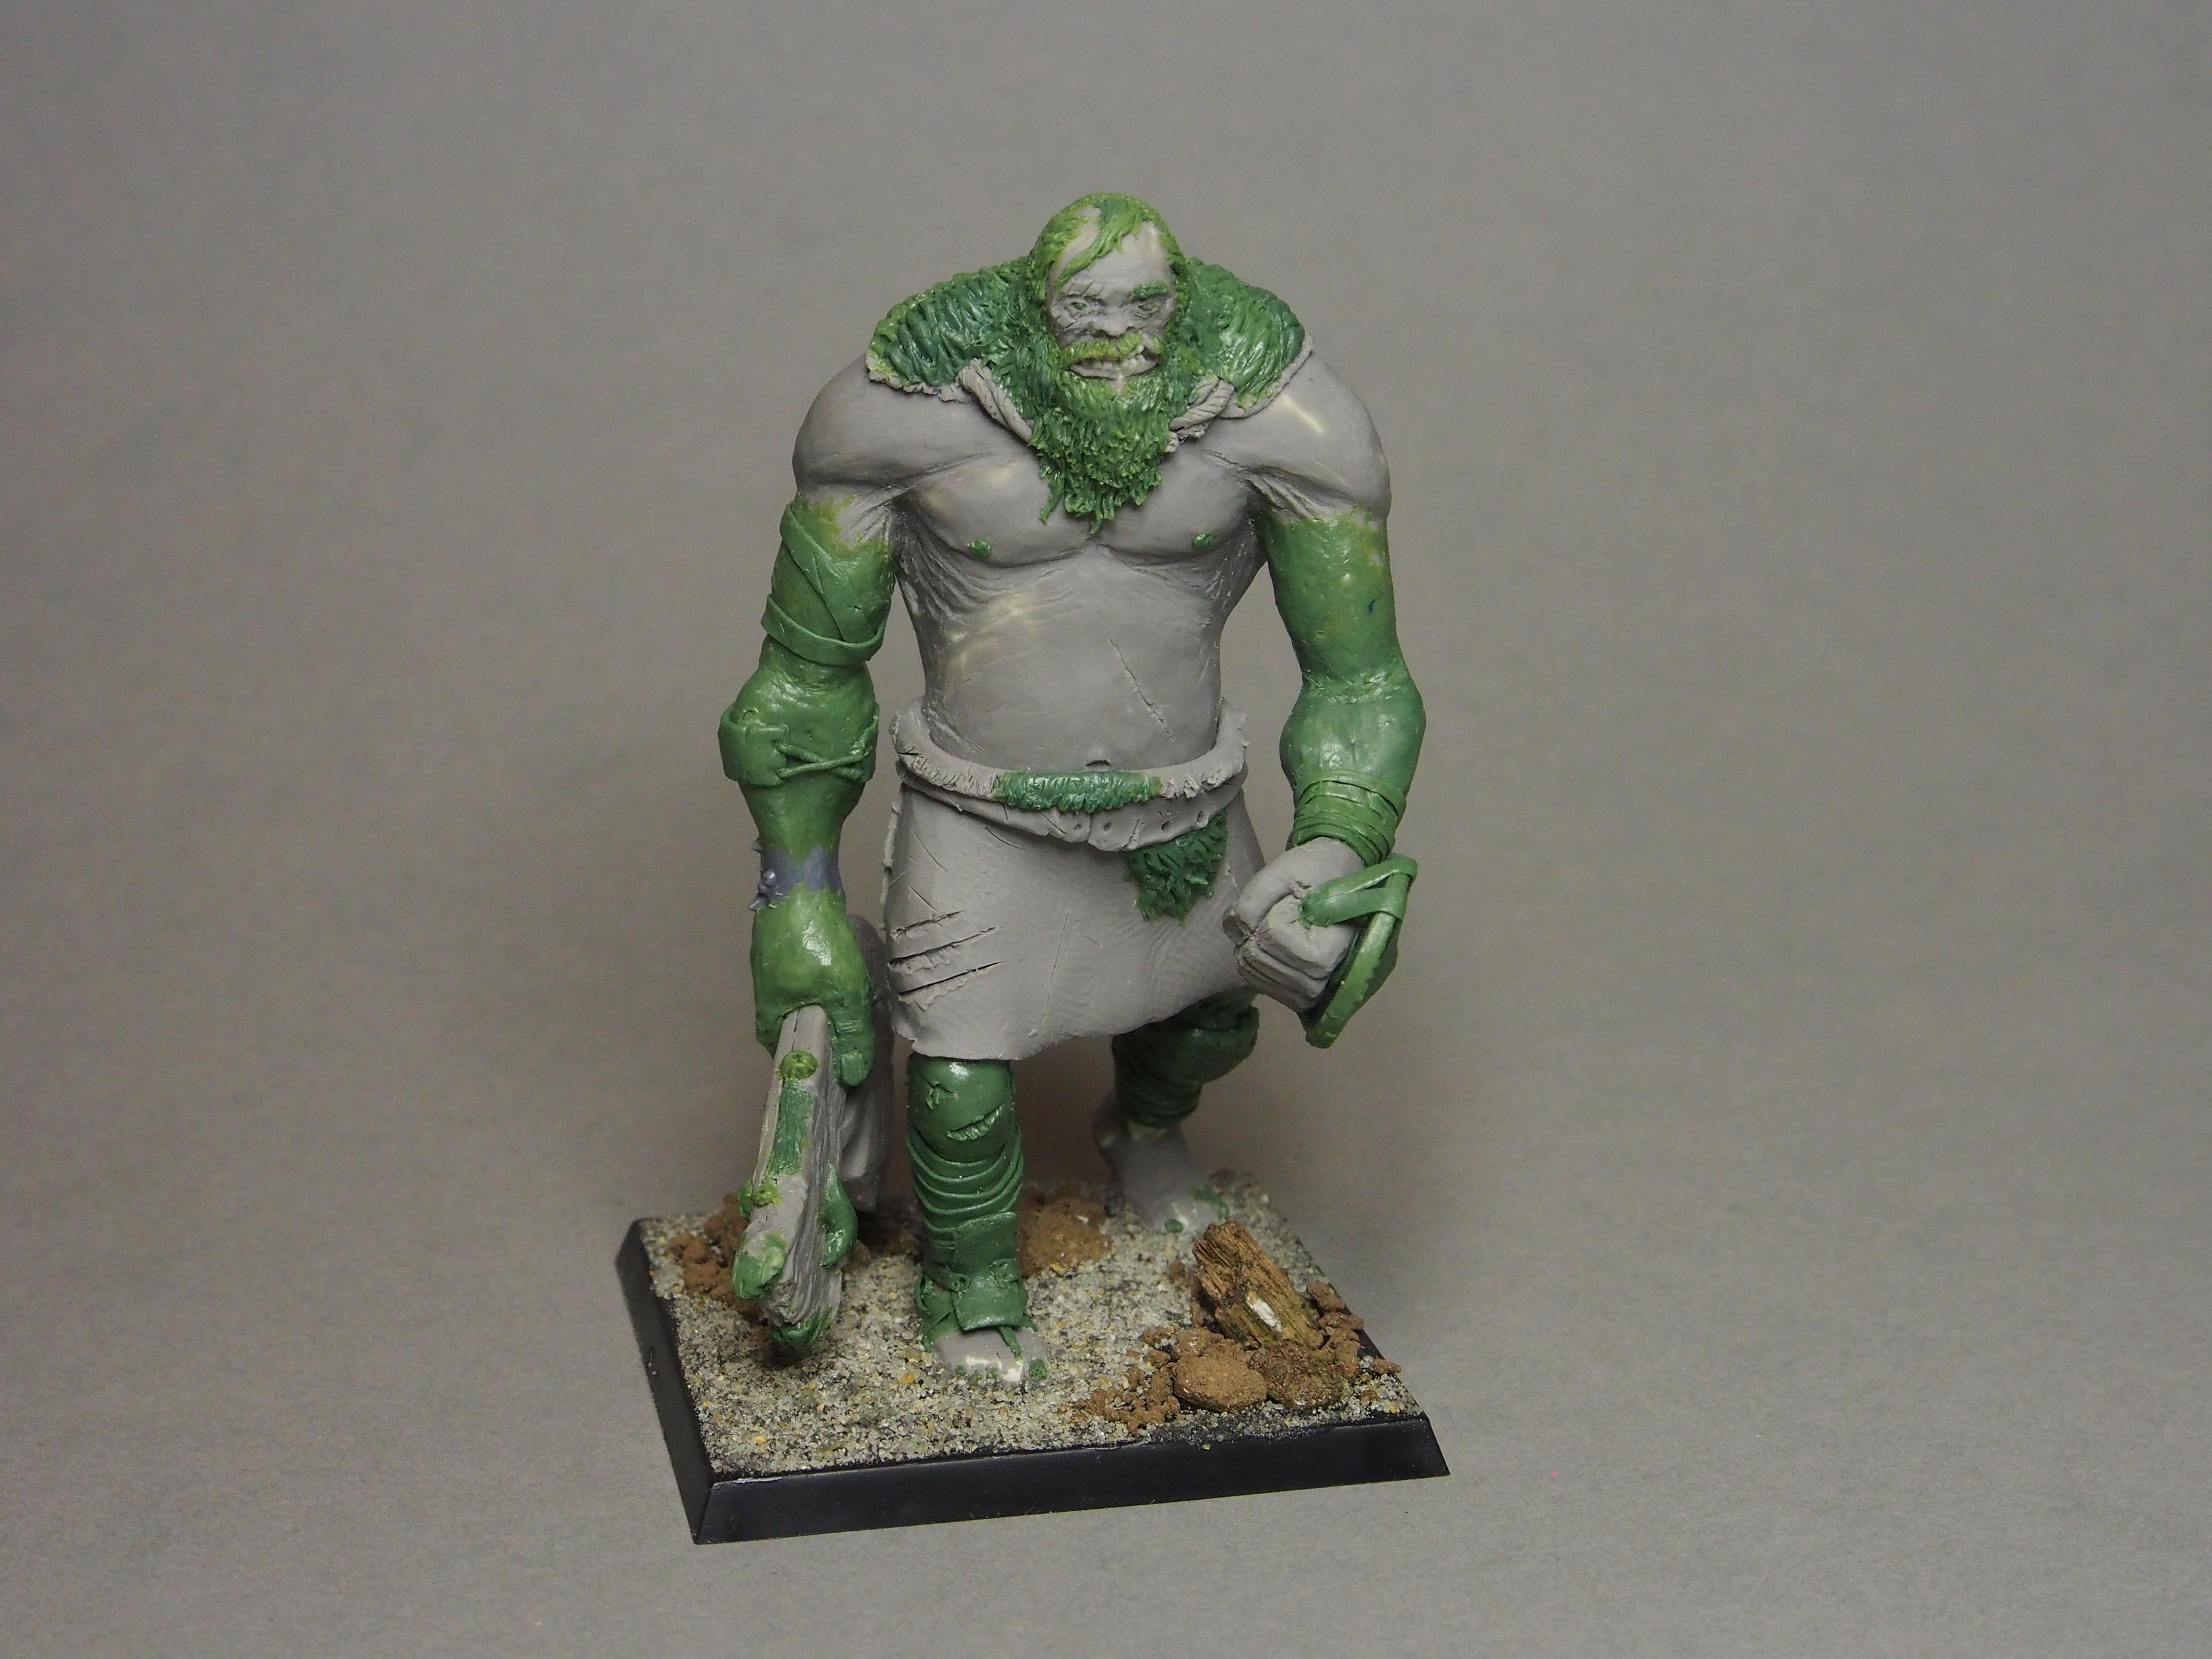 Giant, Greenstuff, Sculpting